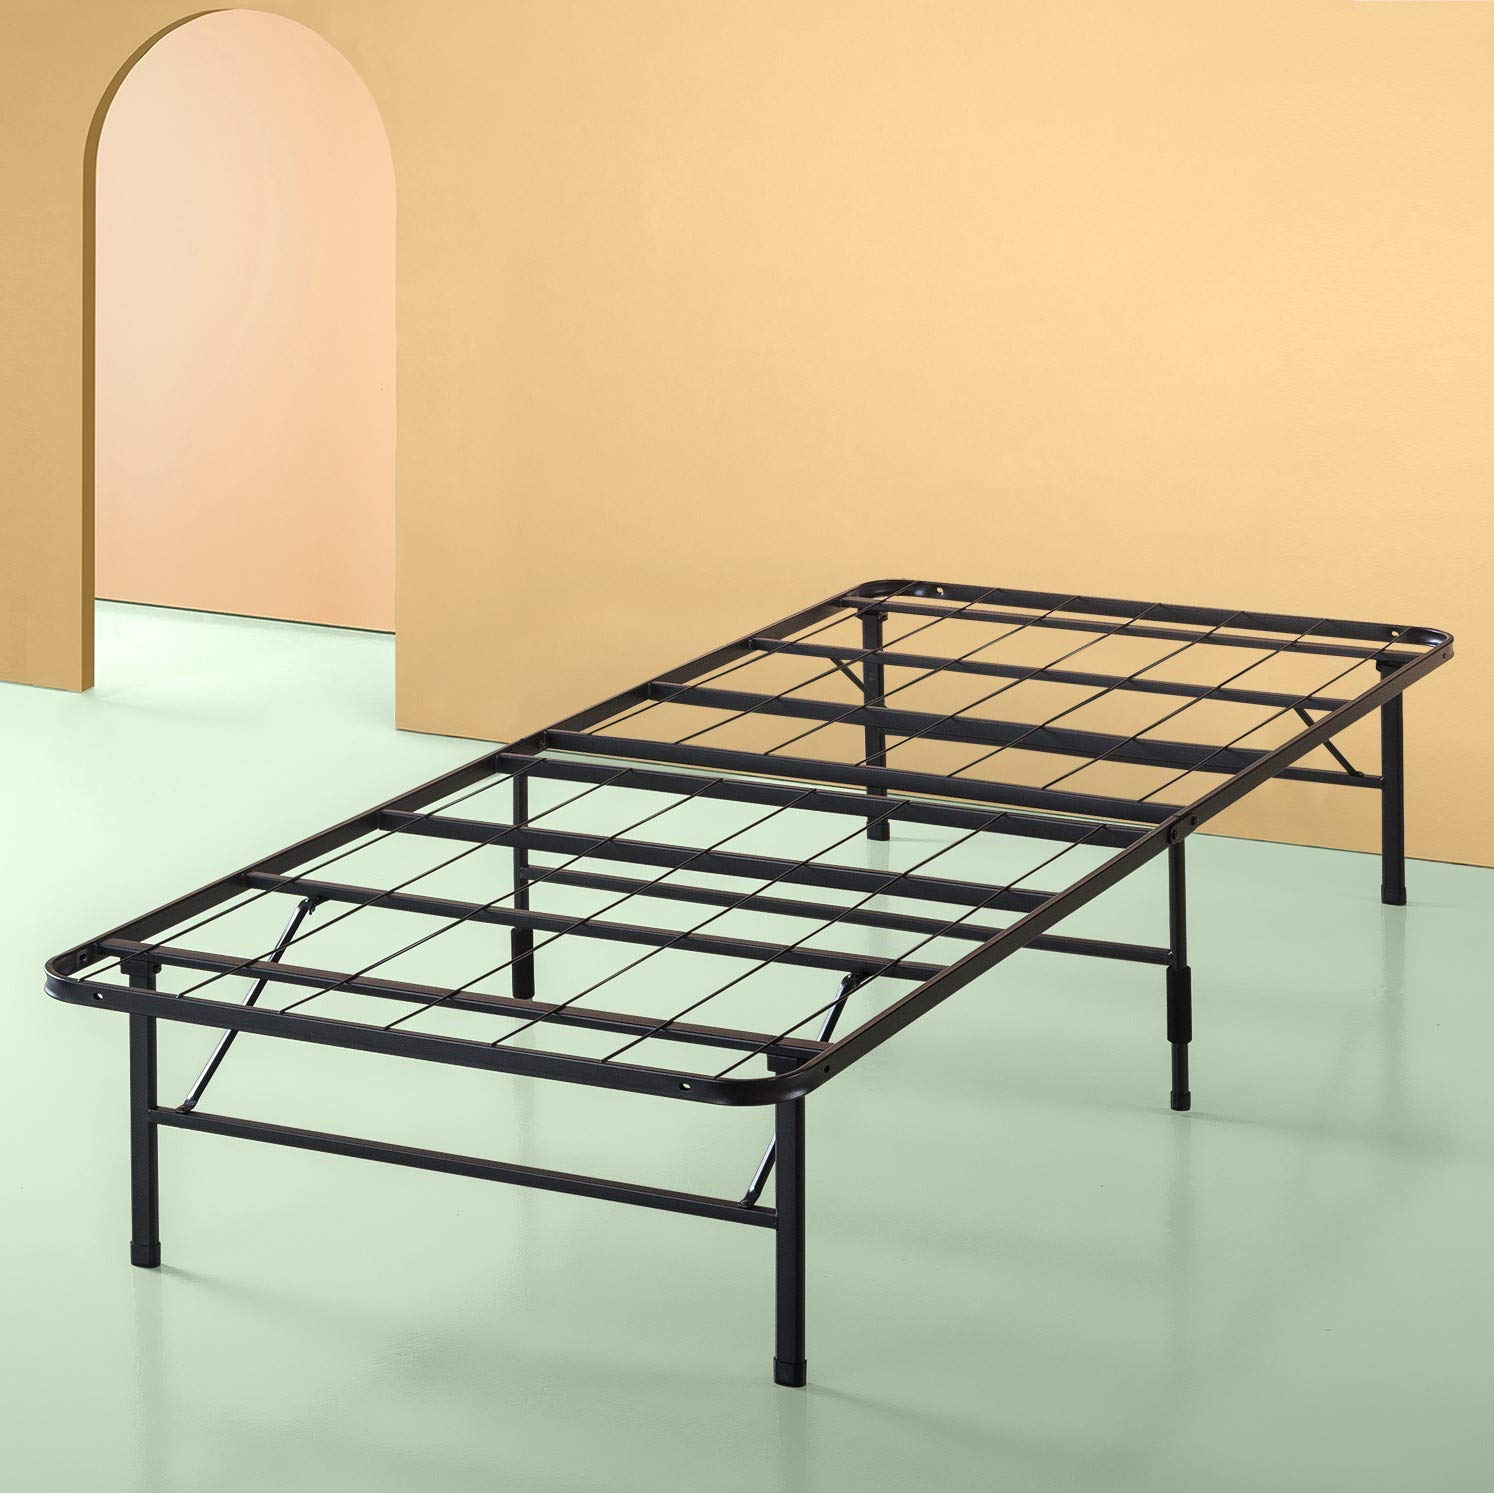 Zinus Shawn 14 Inch SmartBase Mattress Foundation / Platform Bed Frame / Box Spring Replacement / Quiet Noise-Free / Maximum Under-bed Storage, Twin by Zinus